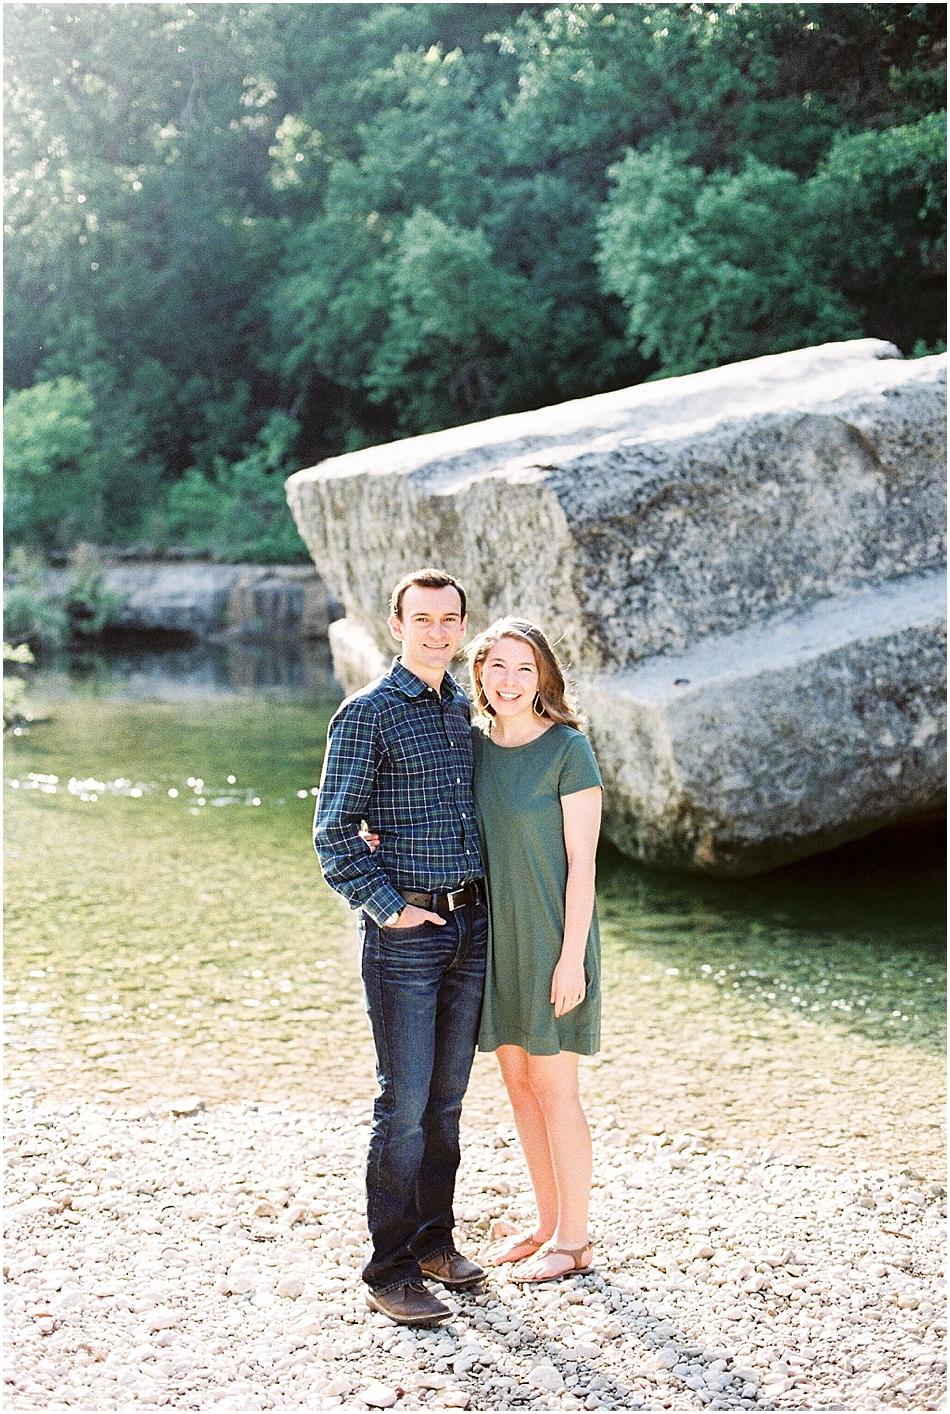 Laura + Nick | Engagement | Fine Art Film | Austin Texas | Emilie Anne Photography.jpg